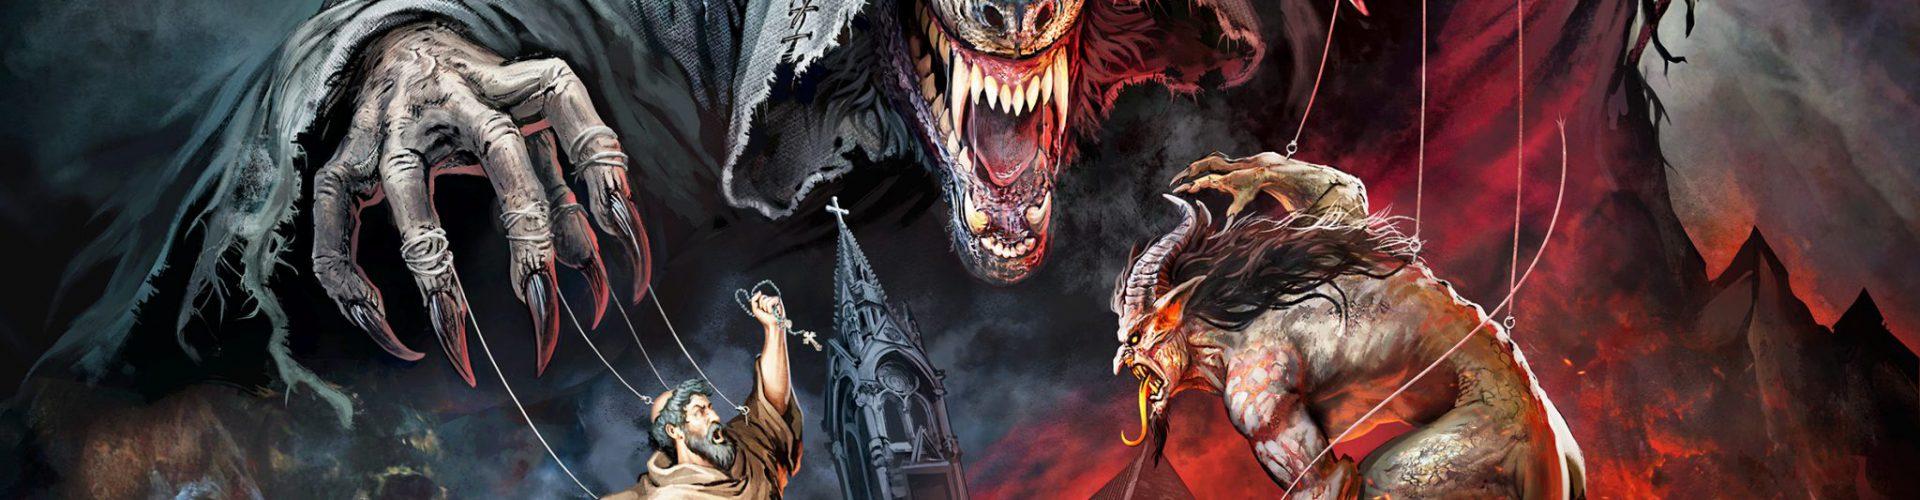 Review: Powerwolf – The Sacrament Of Sin